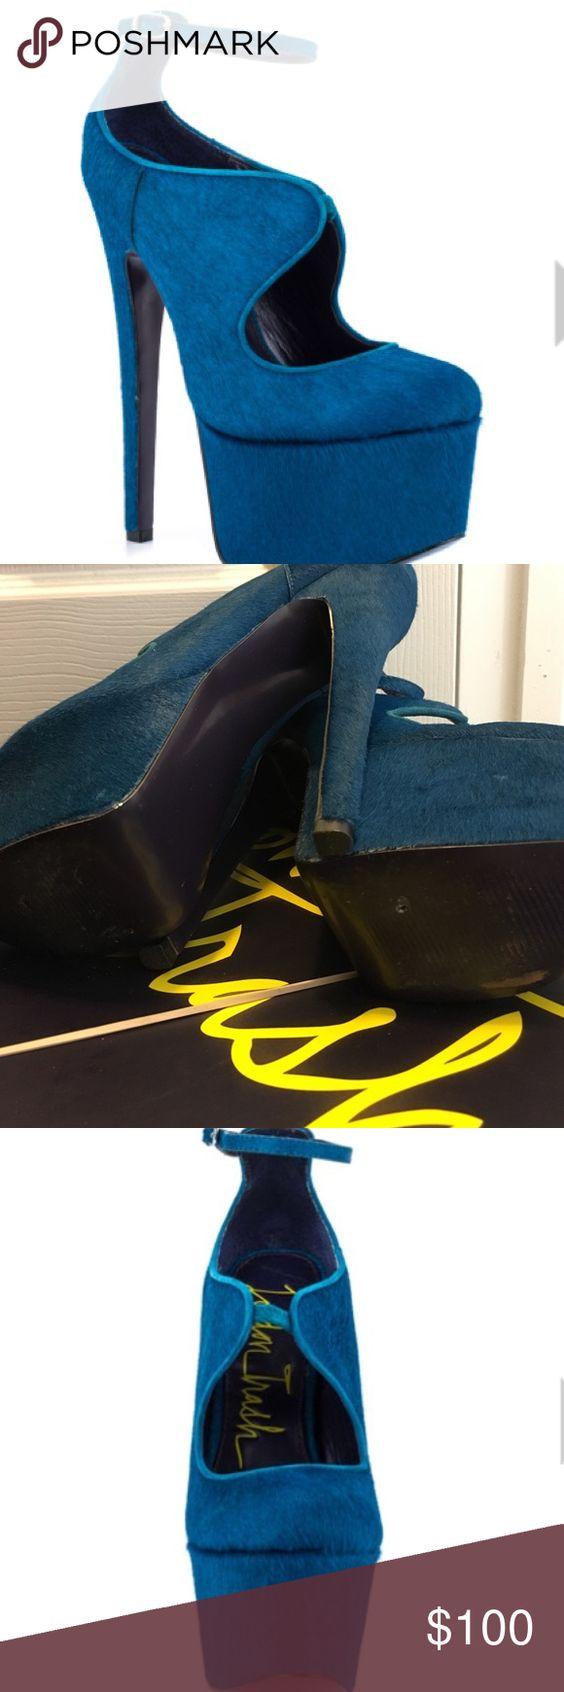 London Trash LT-Candy Teal Teal pony hair monster heels by London Trash! WORN ONCE! London Trash Shoes Platforms